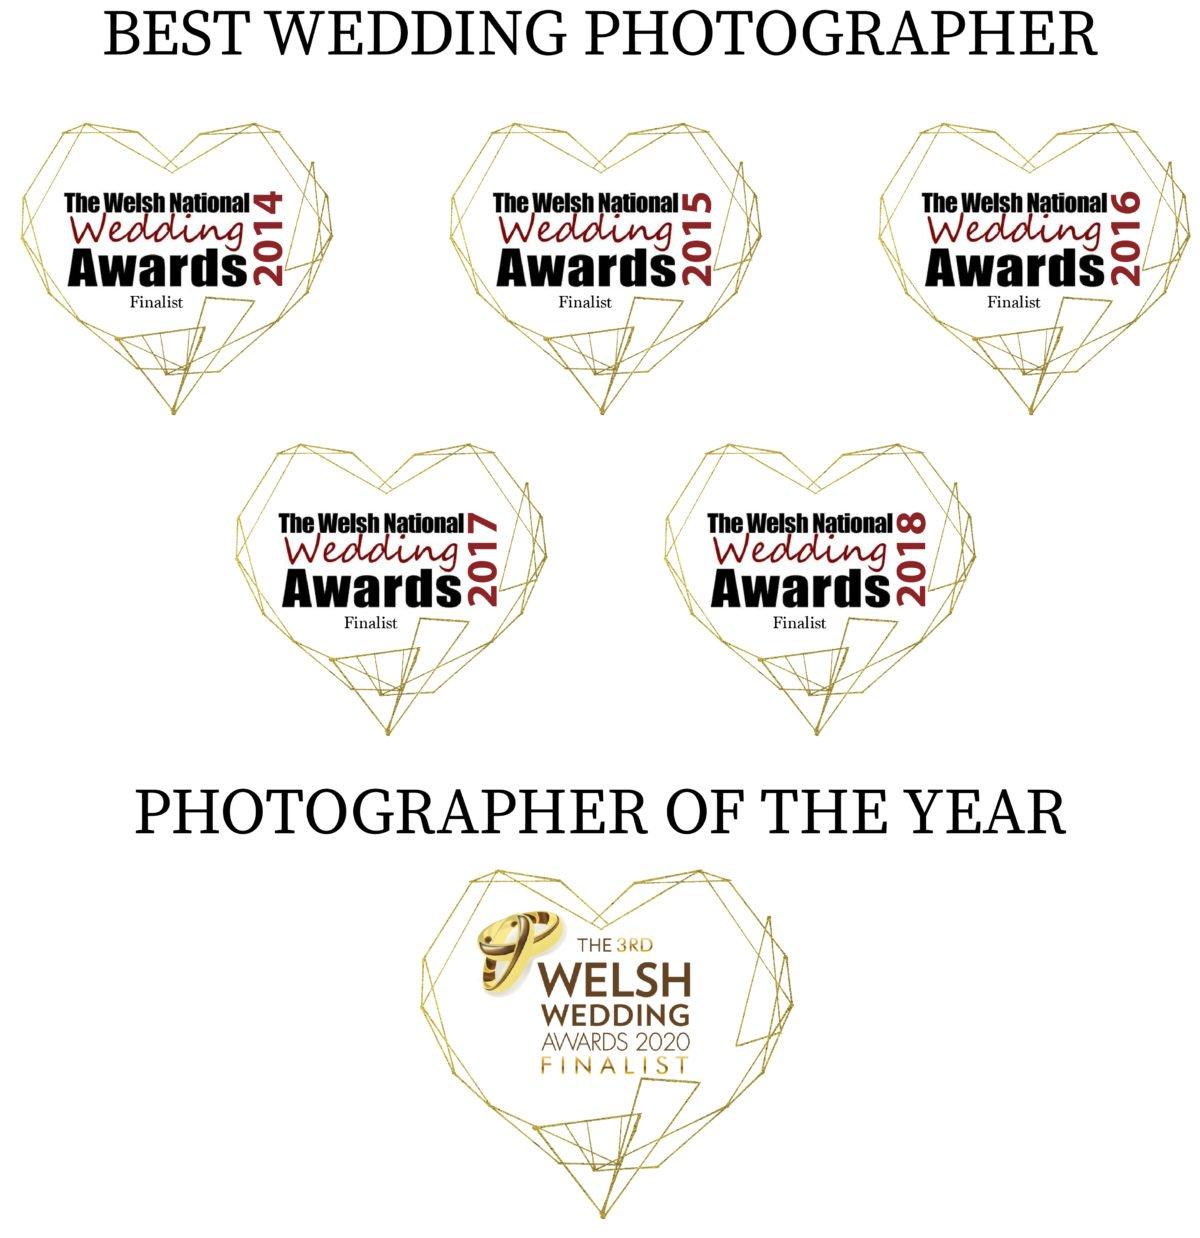 Award winning photographers